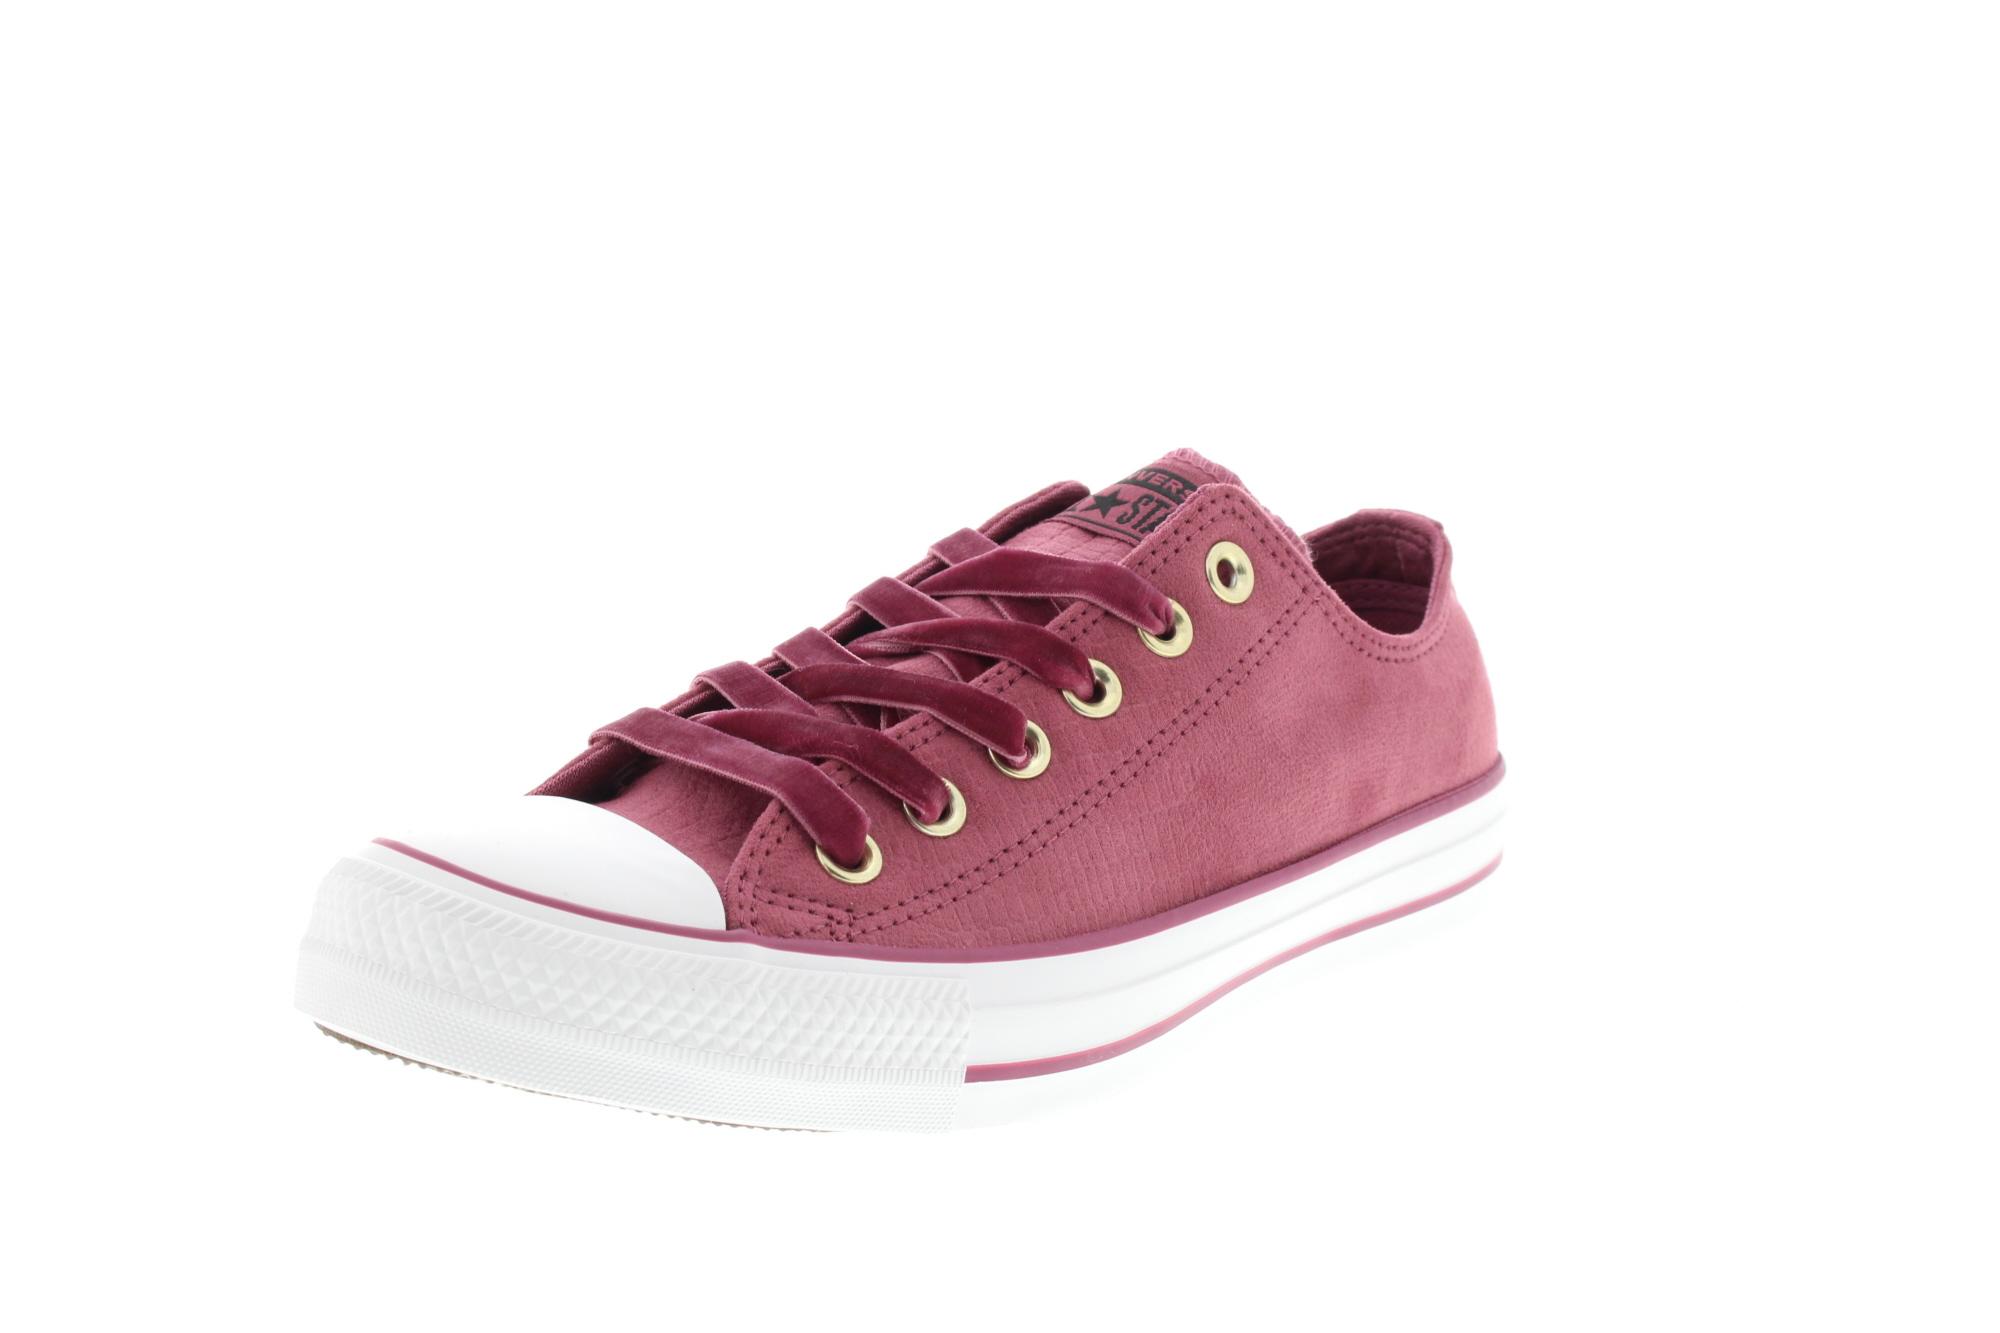 CONVERSE Damen Sneakers - CTAS OX 561706C - vintage vine0-6620